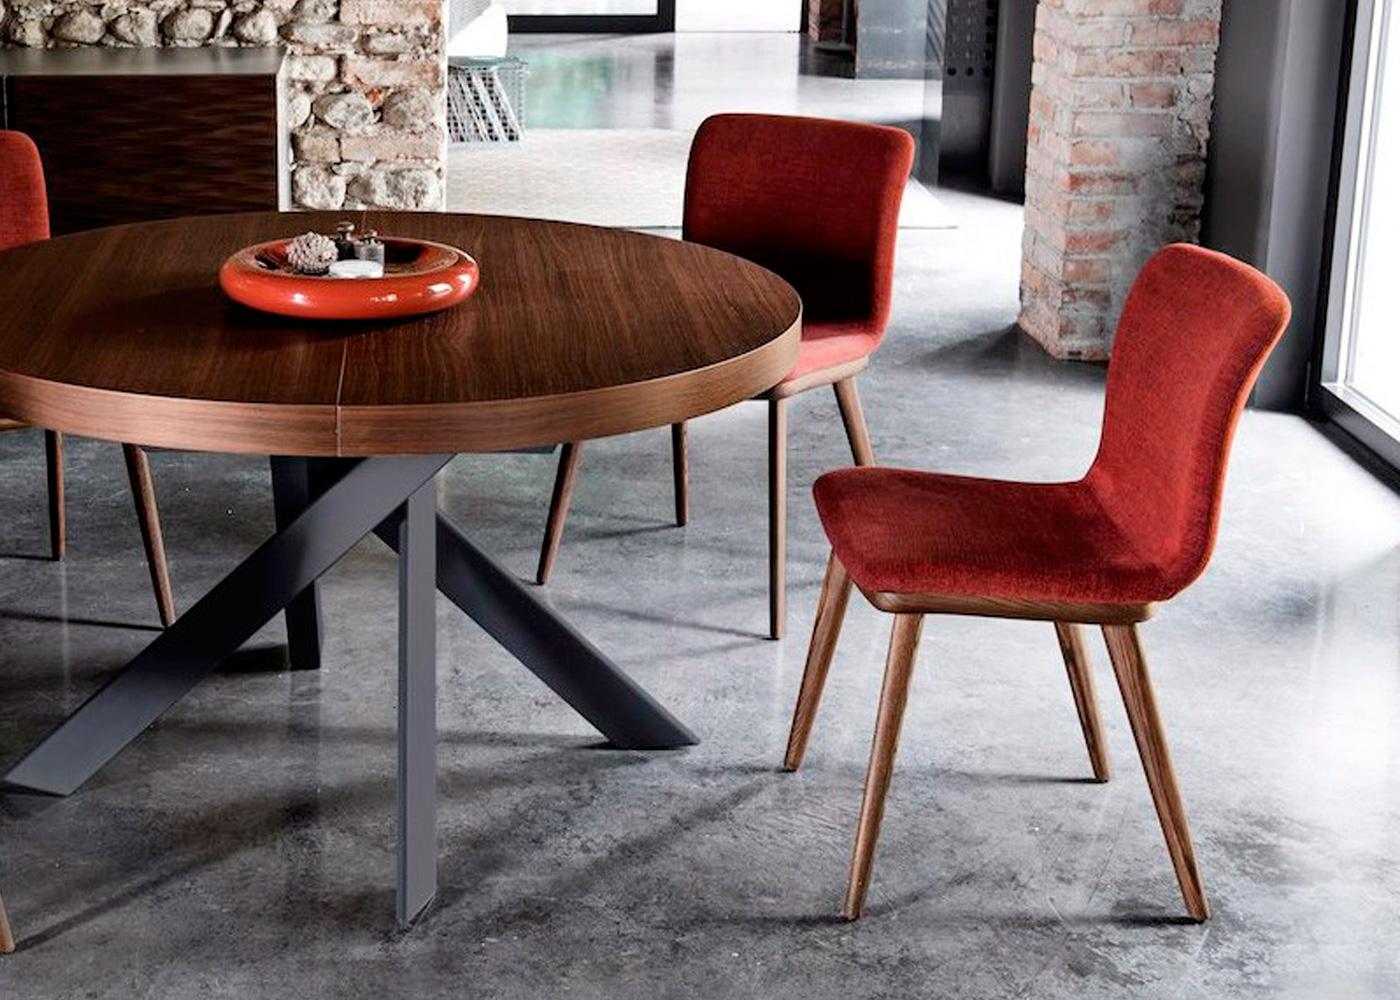 calligaris sofas uk furniture sofa bed singapore annie chair midfurn superstore